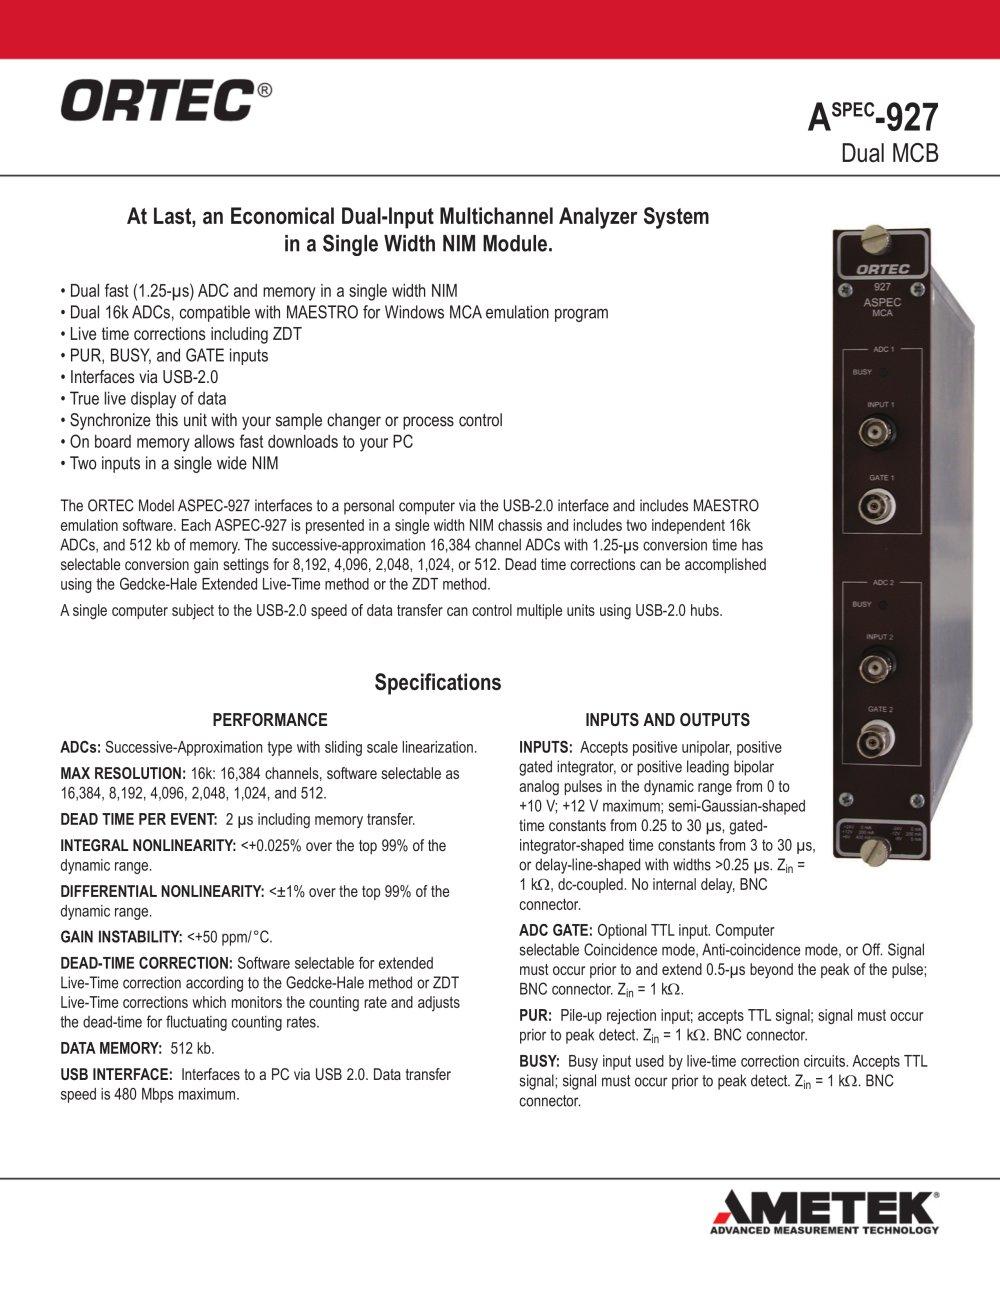 Aspec 927 dual mcb ortec pdf catalogue technical aspec 927 dual mcb 1 2 pages nvjuhfo Gallery